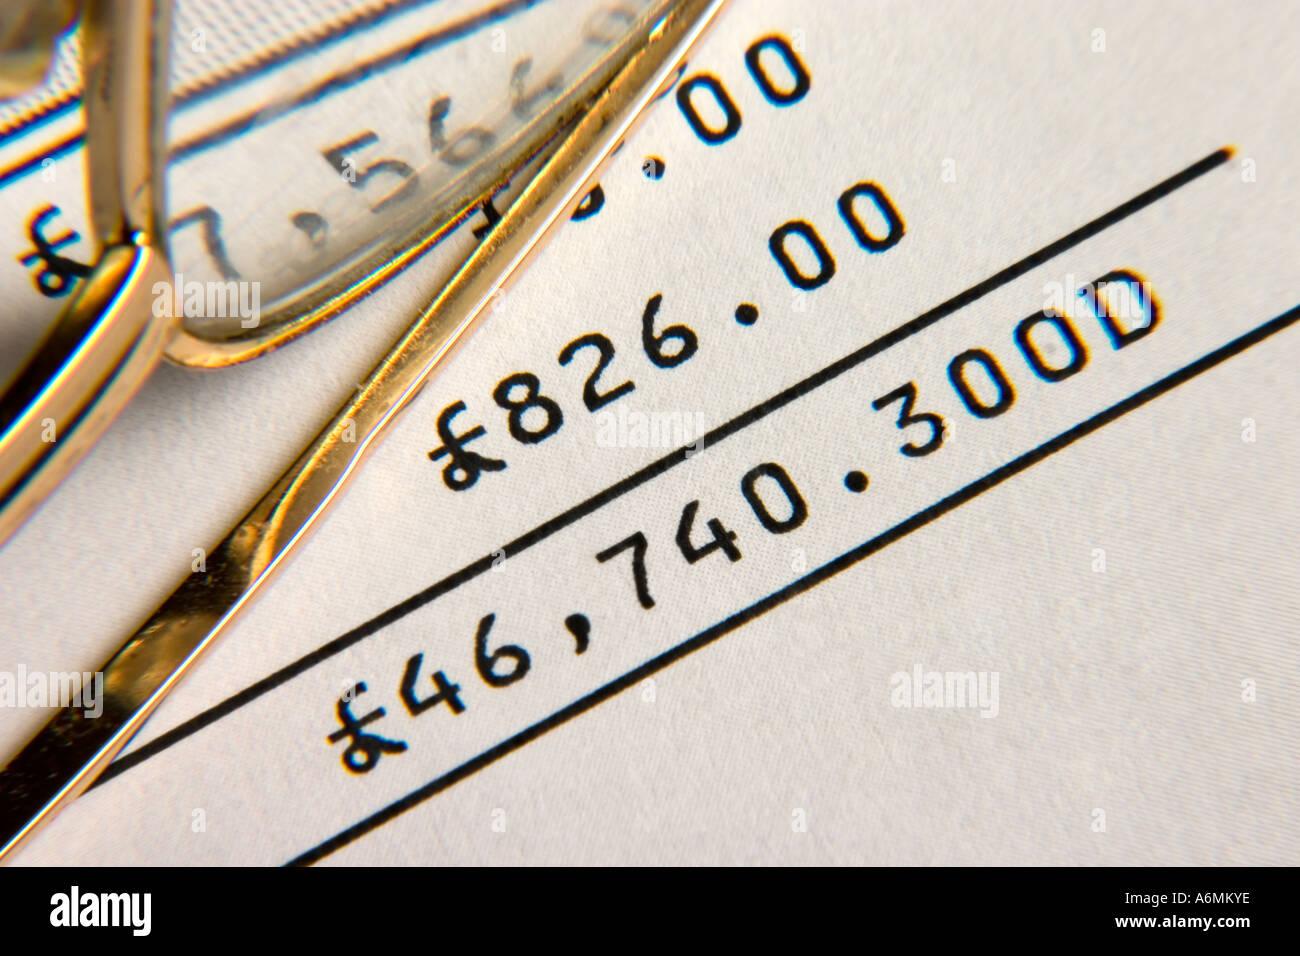 Overdrawn bank statement - Stock Image